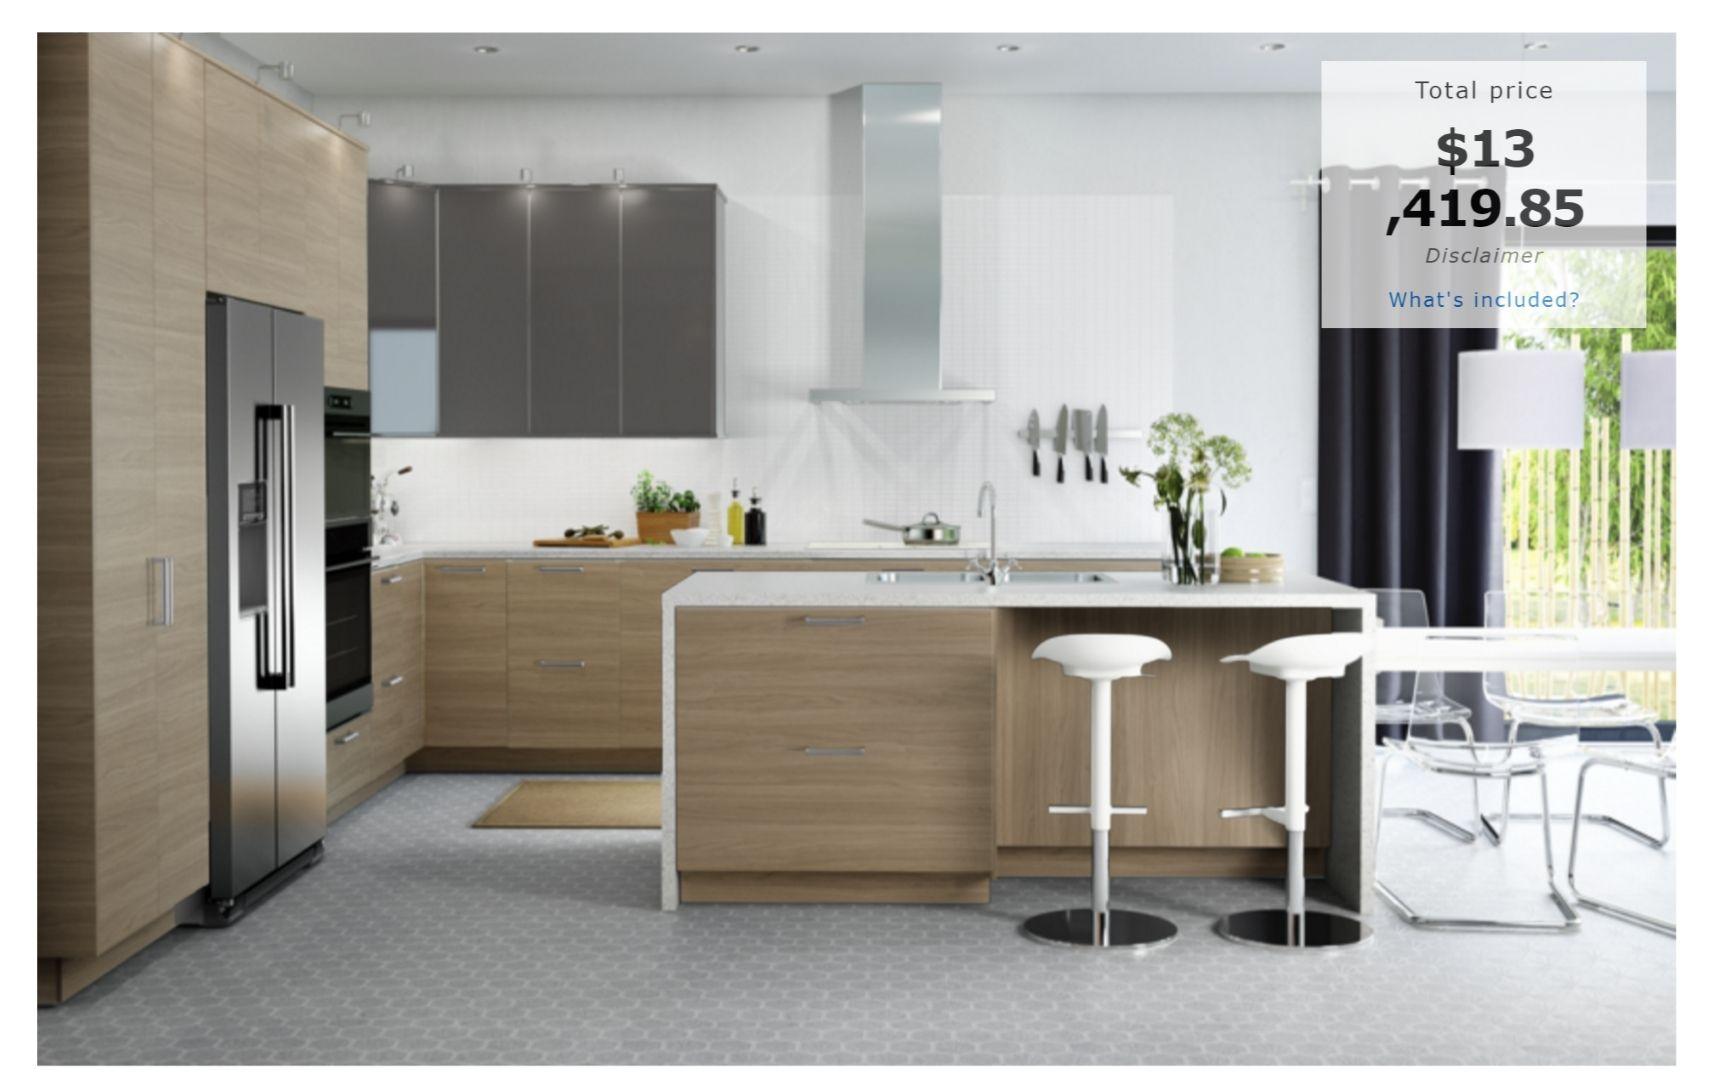 ikea modern kitchen Google Search Cost of kitchen